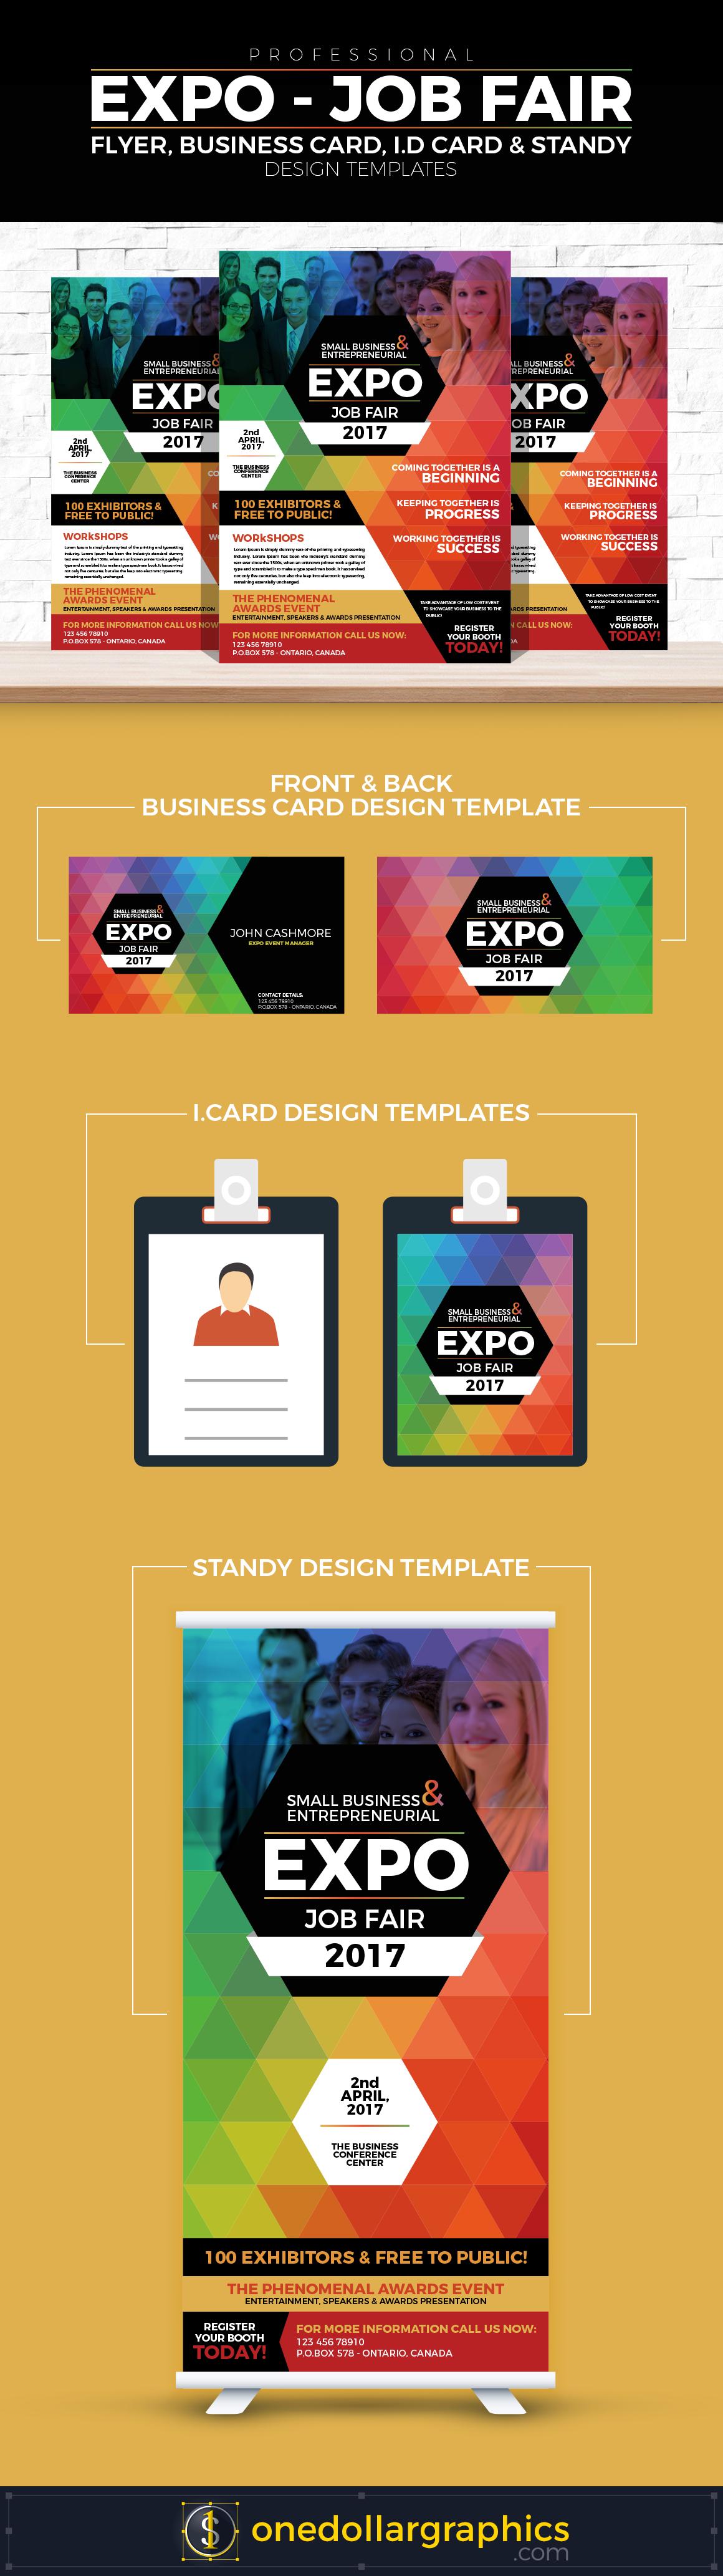 Professional-Job-Expo-Job-Fair-Flyer,-Business-Card,-I.D-Card-&-Standy-Design-Templates